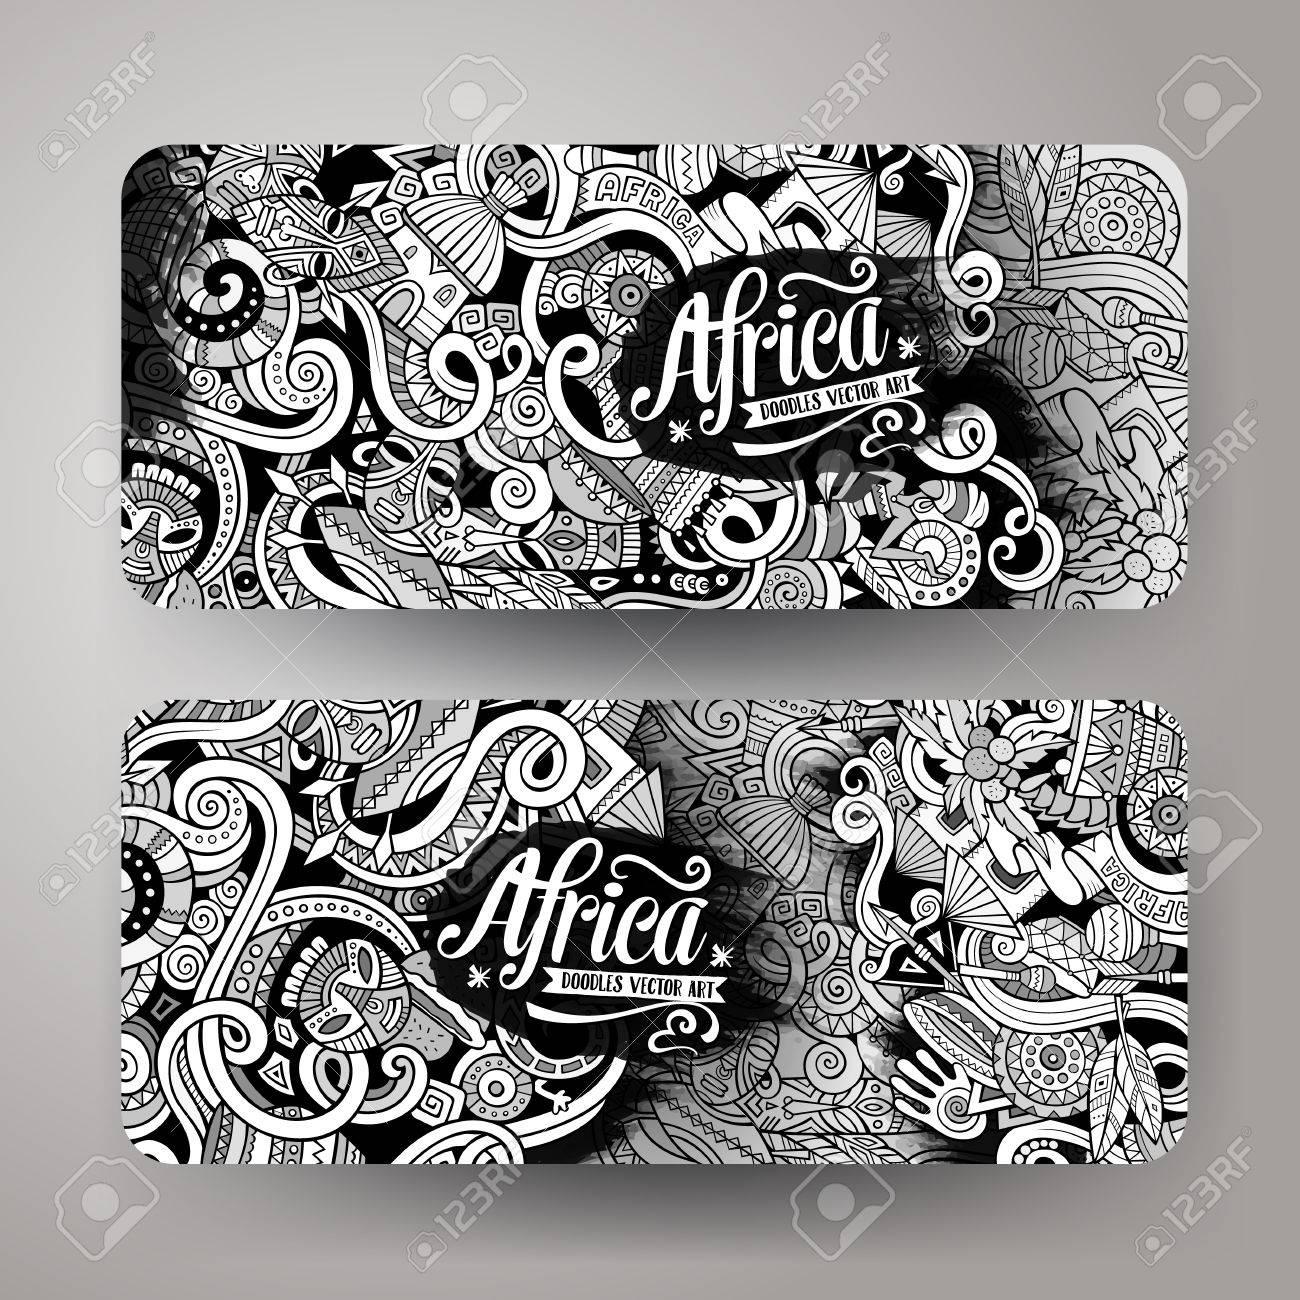 1300x1300 Cartoon Cute Vector Hand Drawn Doodles Africa Corporate Identity